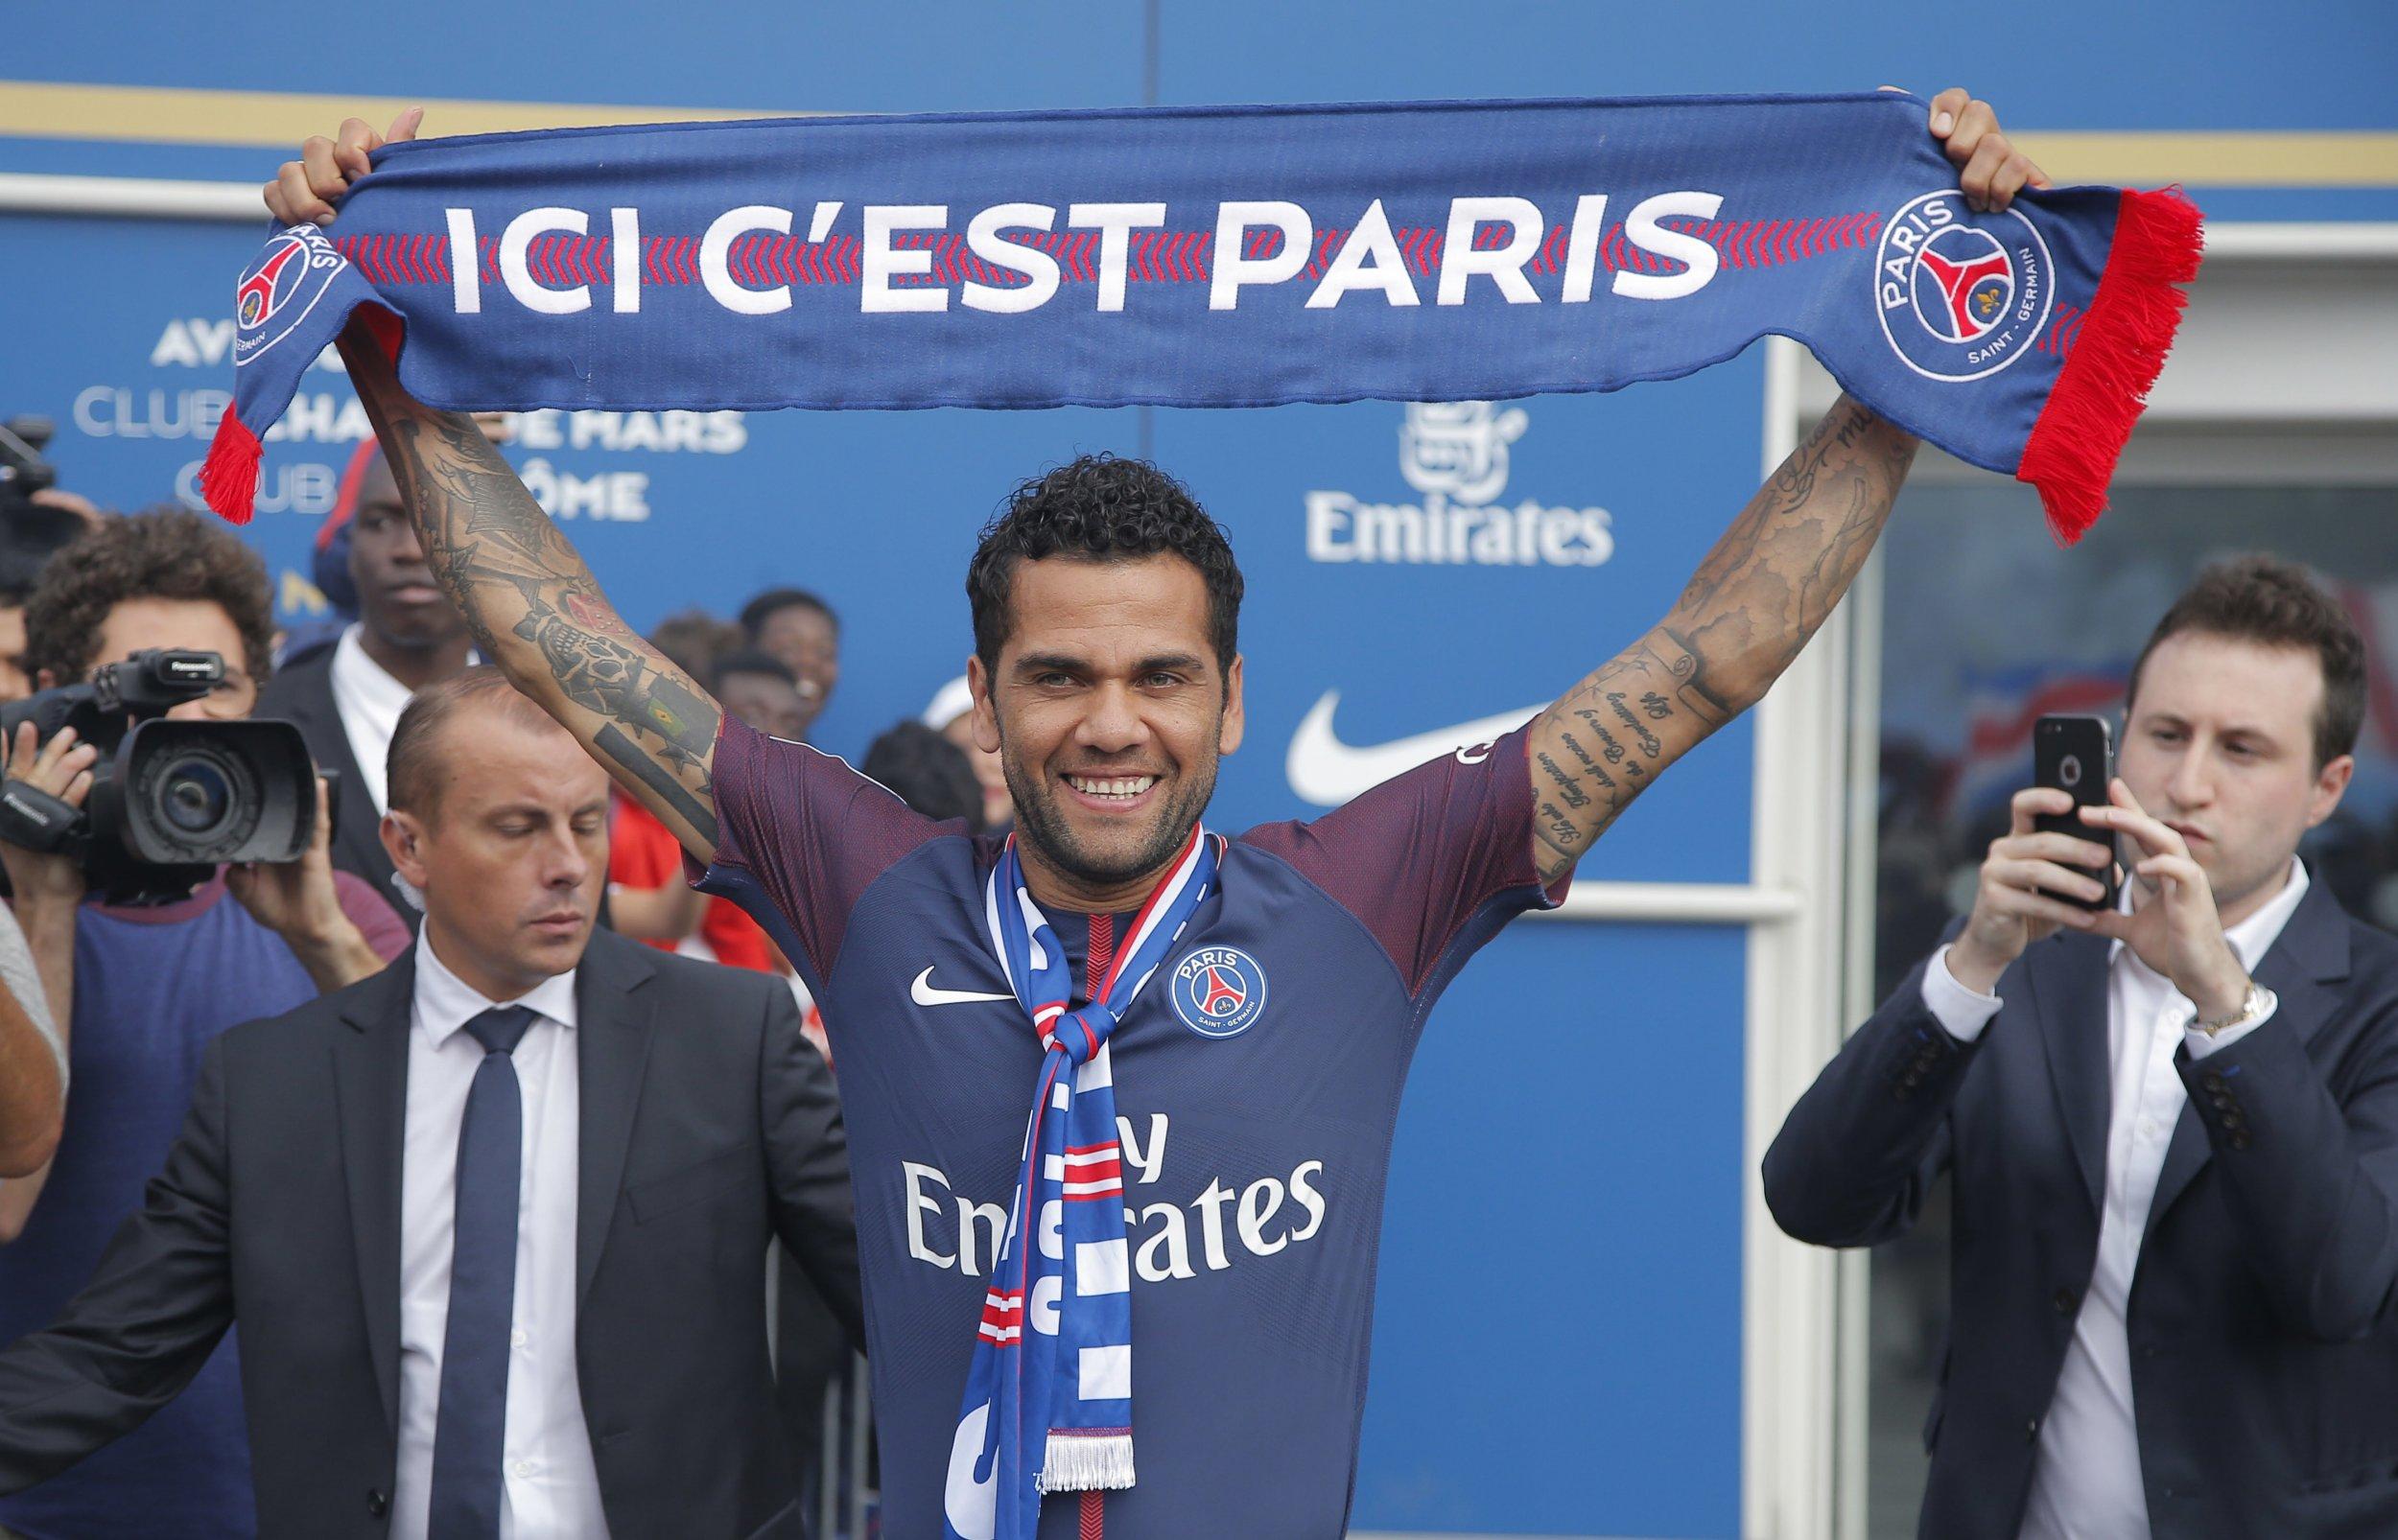 Dani Alves reveals he joined Paris Saint-Germain to play with Marco Verratti